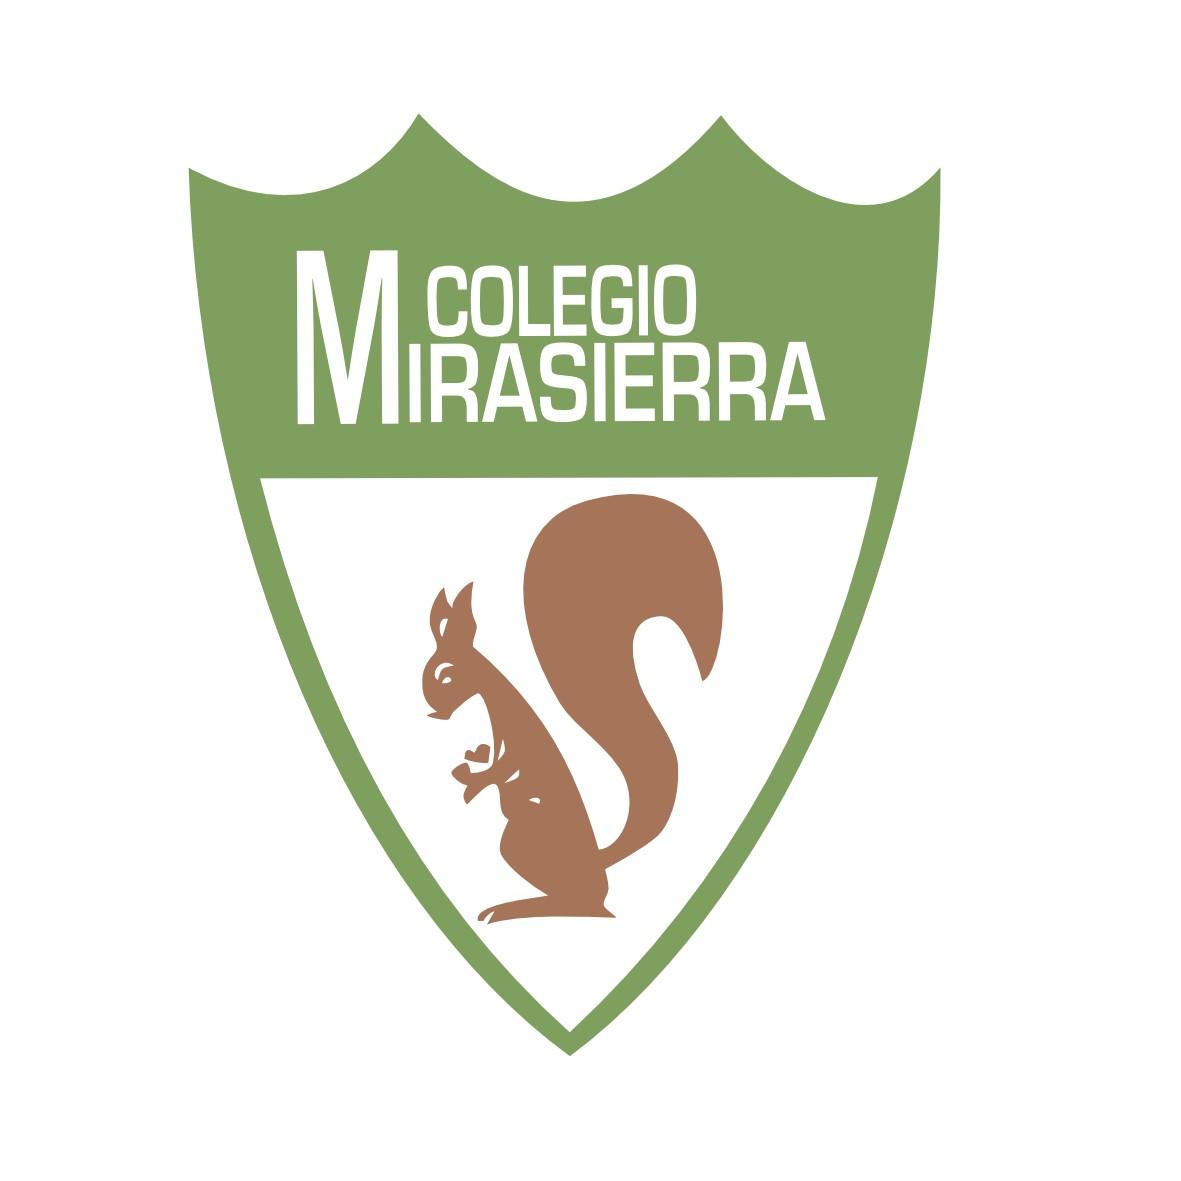 Colegio Mirasierra